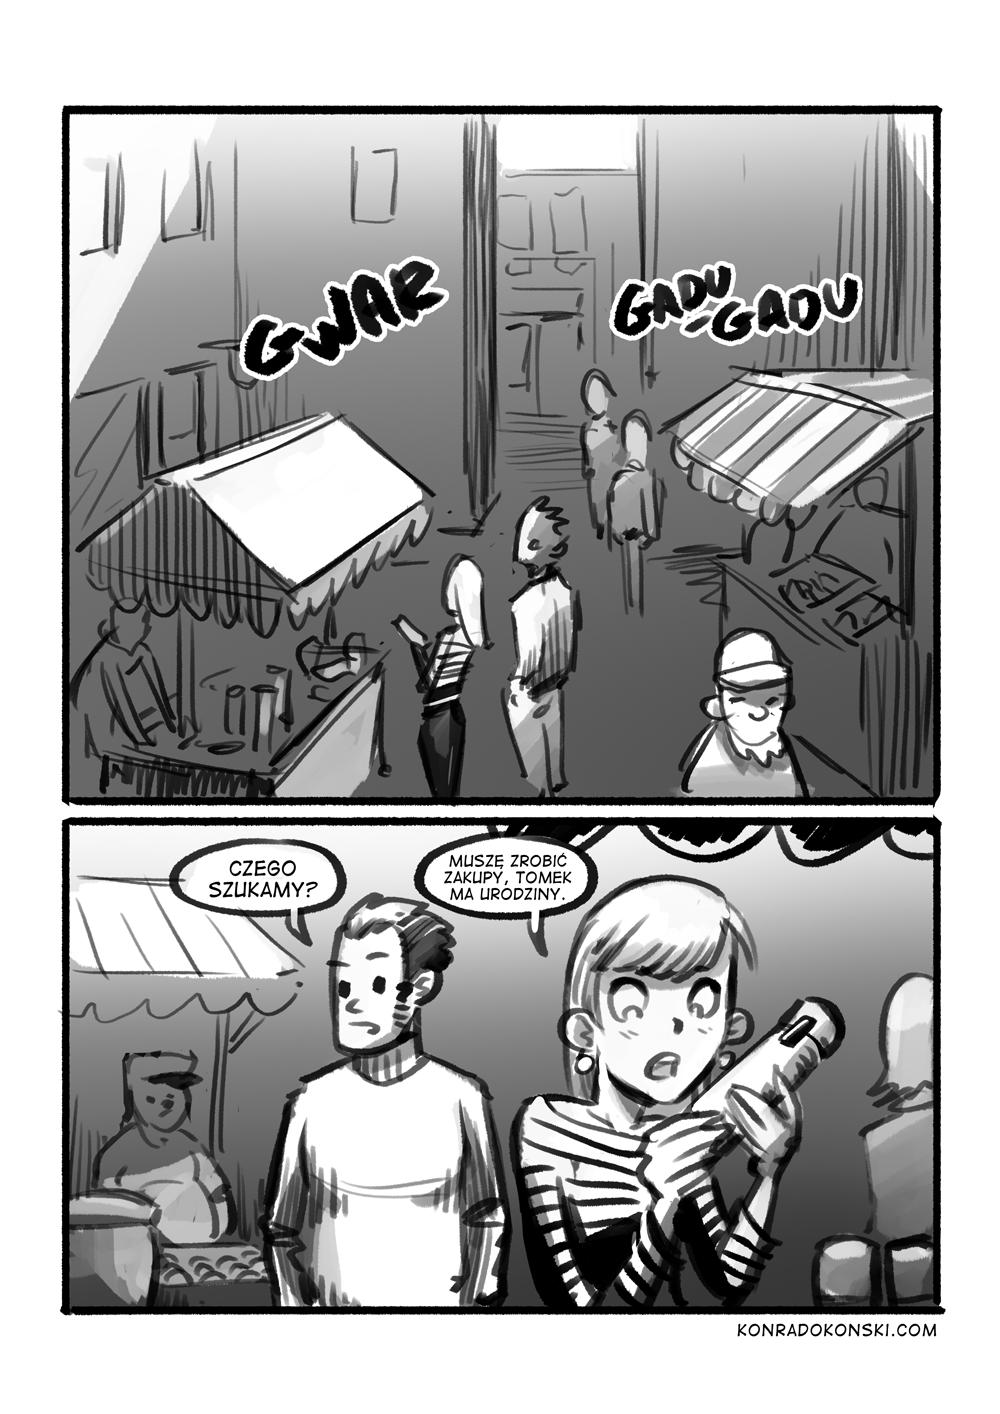 Gratka – komiks 24h – 01